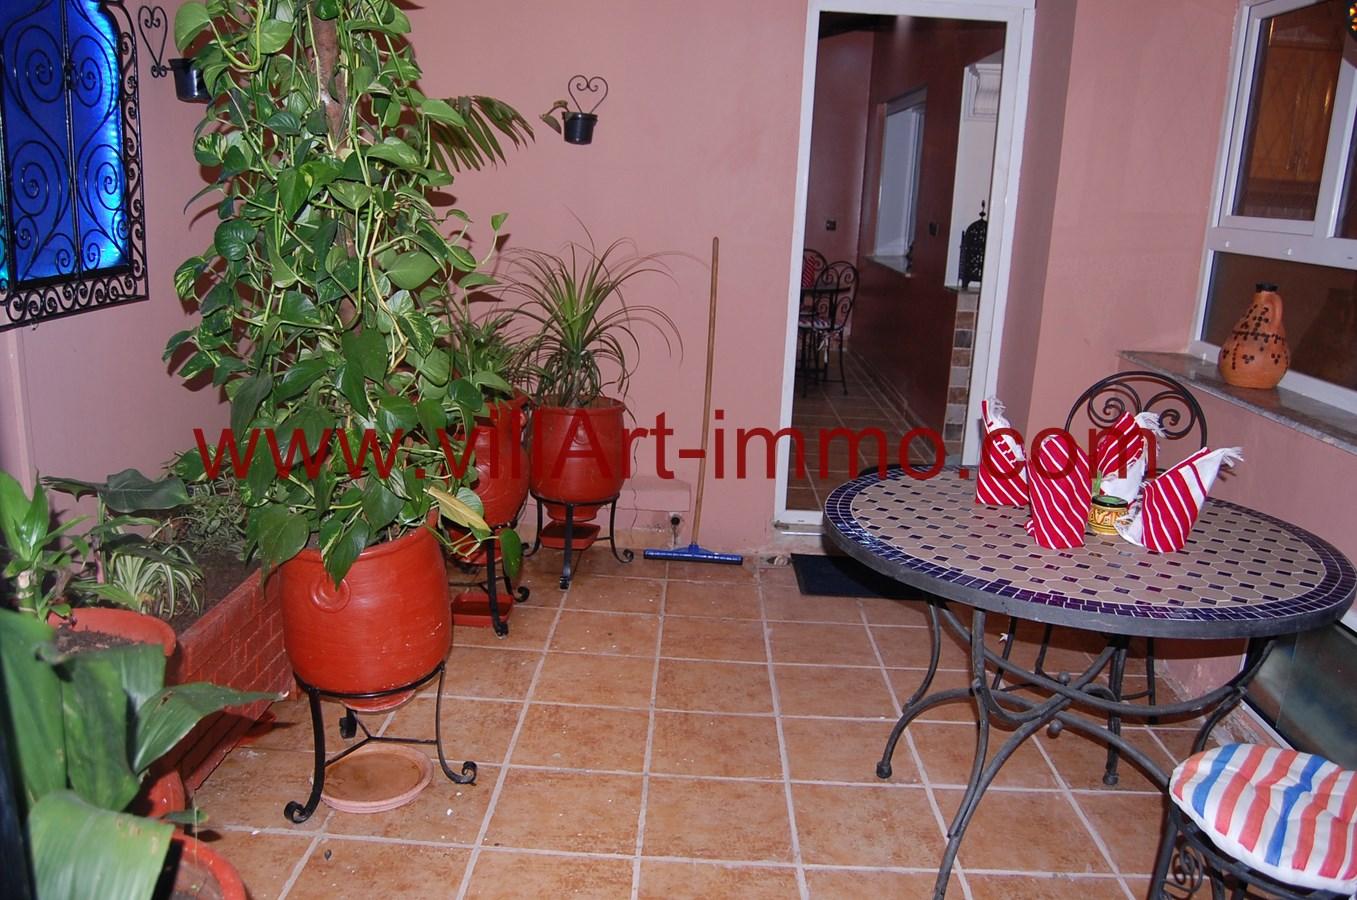 5-location-appartement-meuble-iberia-tanger-balcon-l895-villart-immo